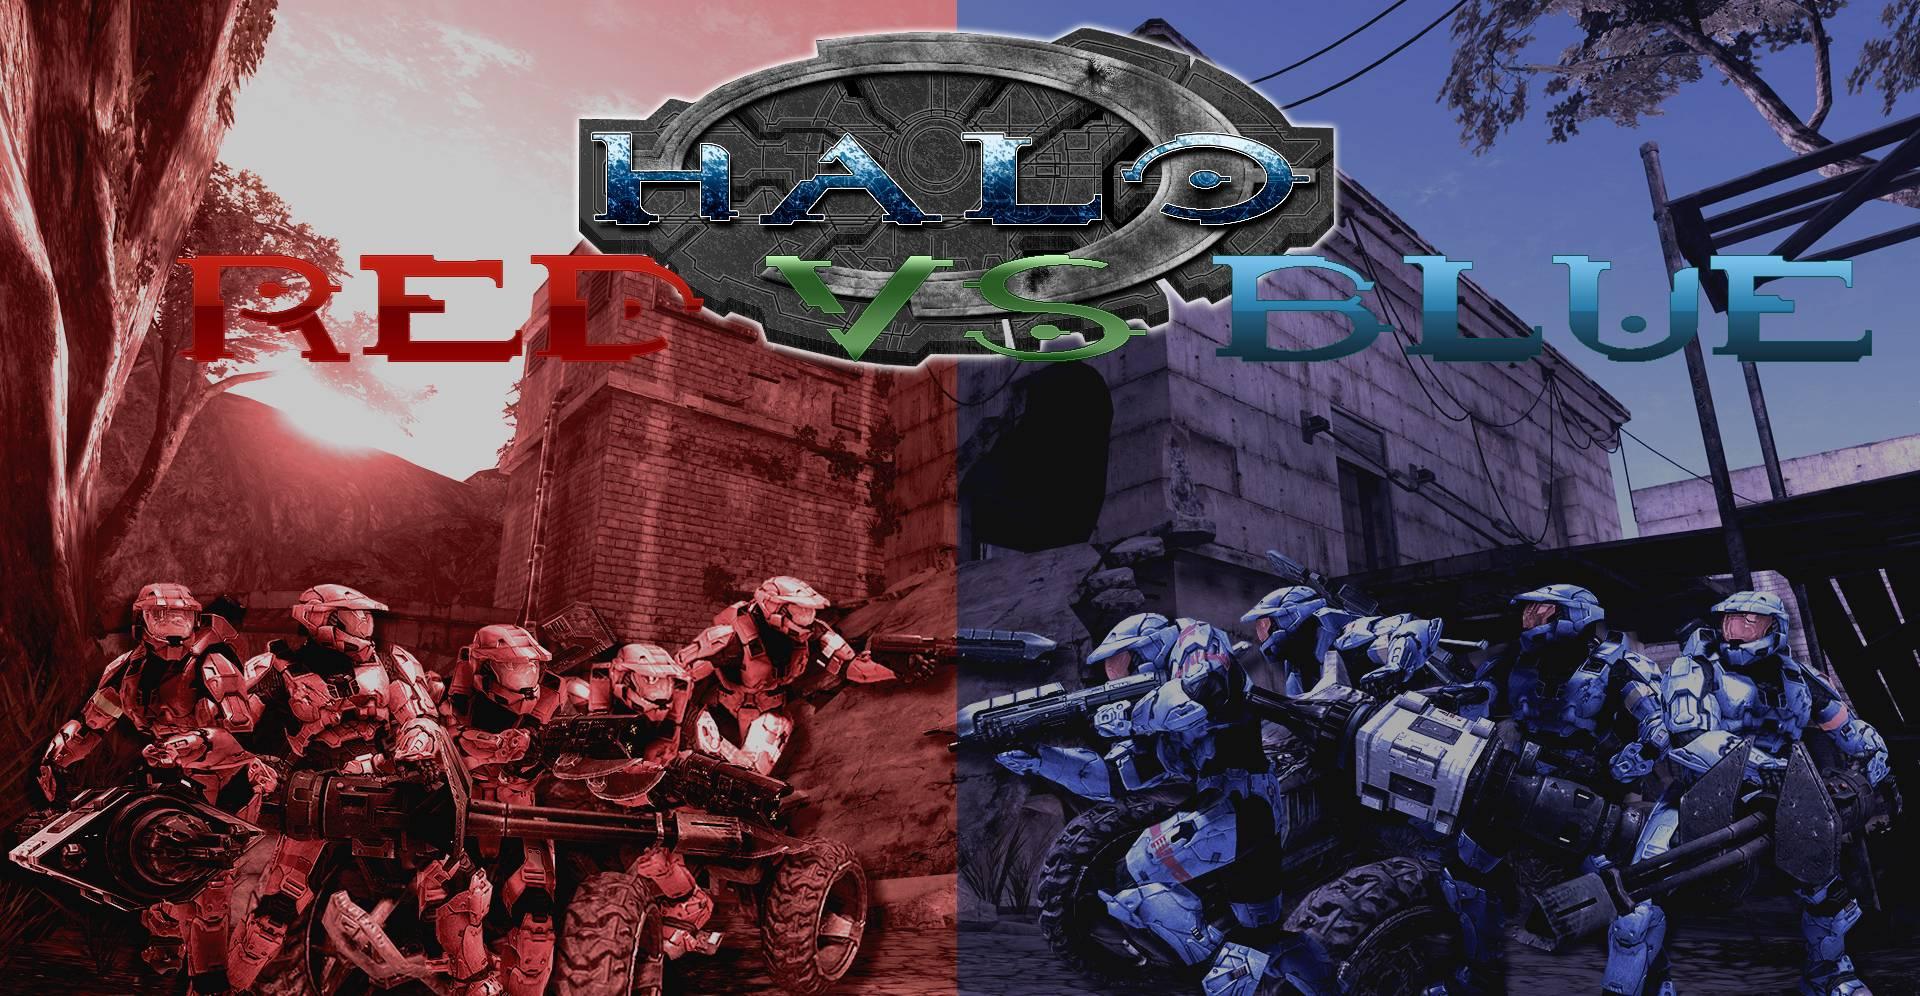 halo vs battlefield wallpaper - photo #32